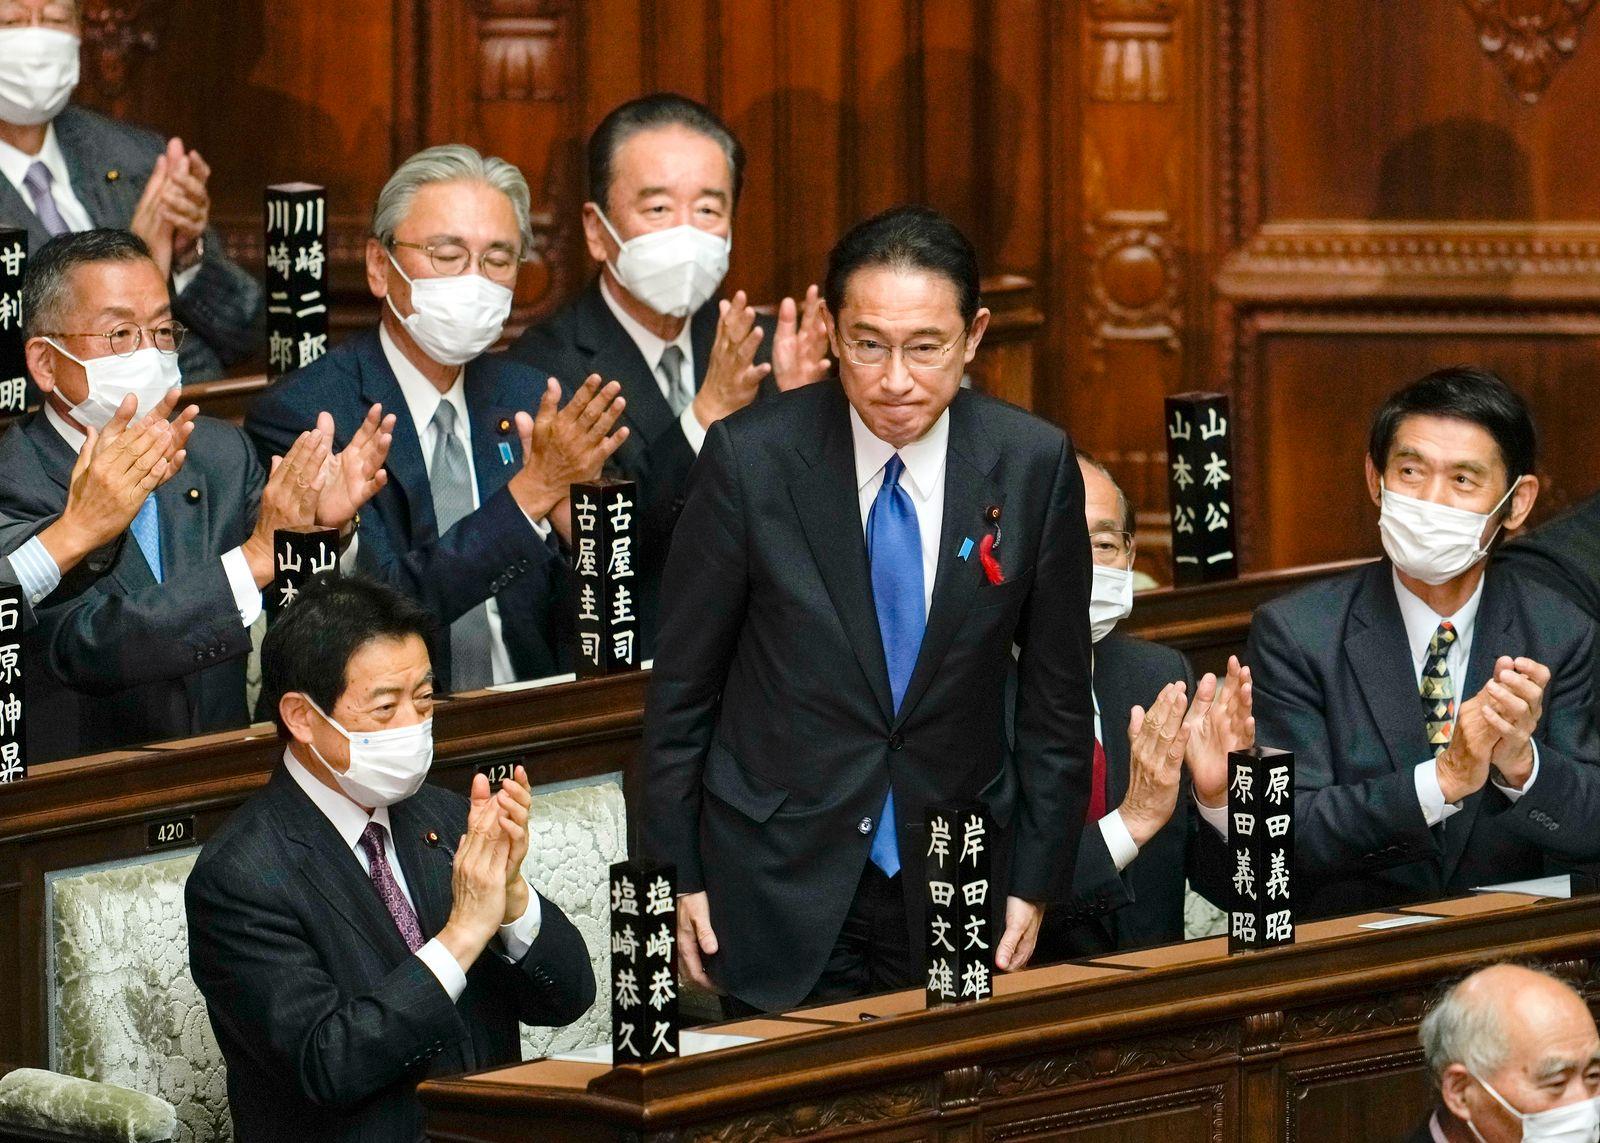 Fumio Kishida becomes new Japanese Prime Minister